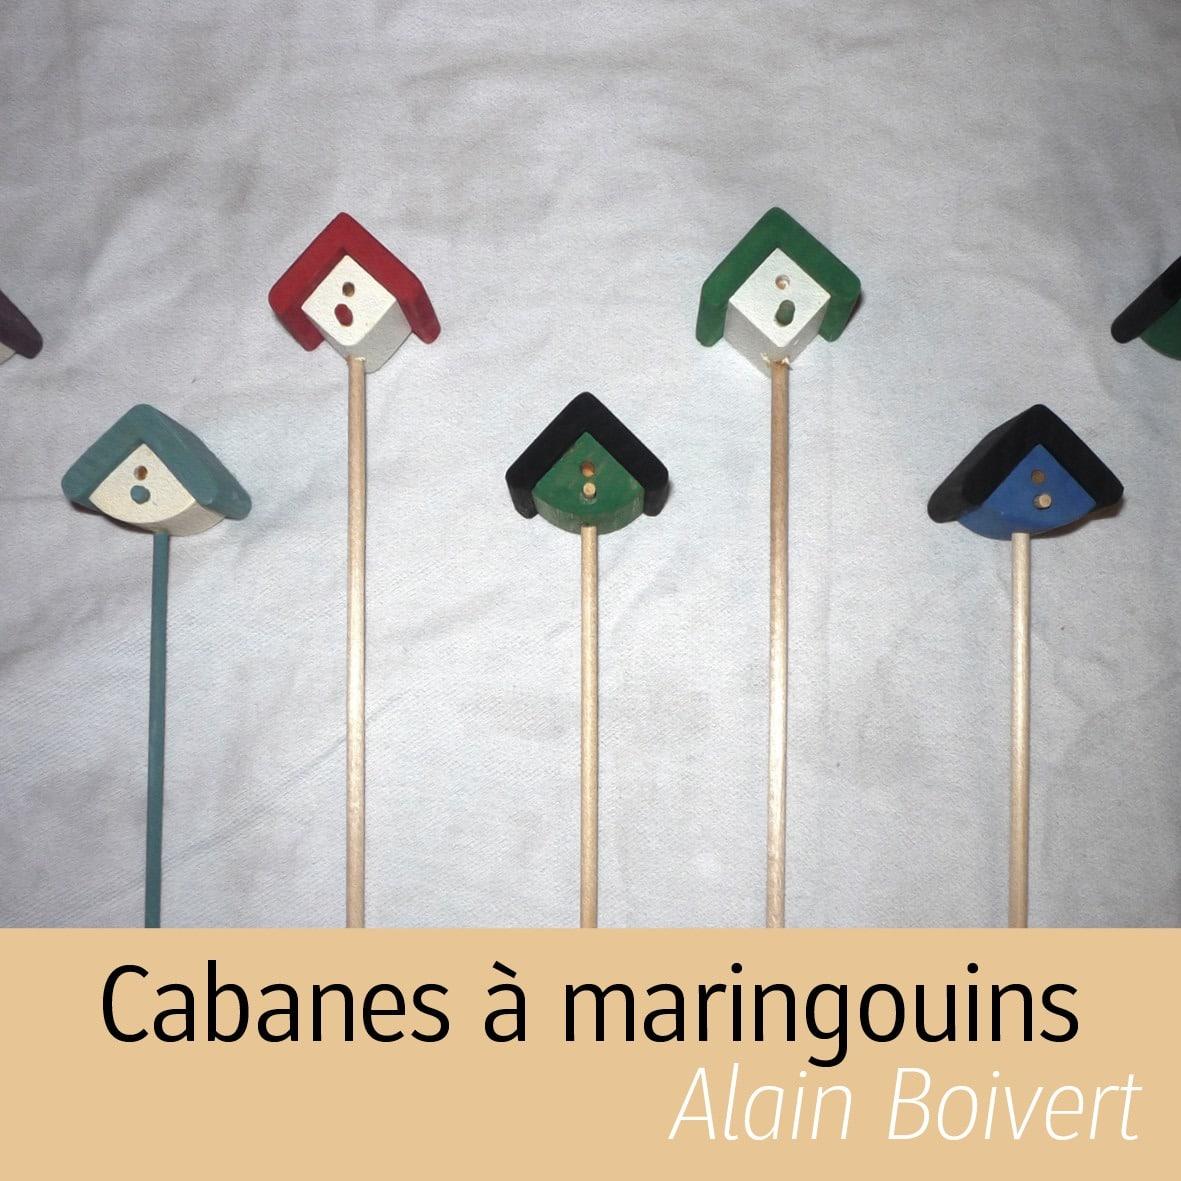 cabanes à maringouins Alain Boisvert